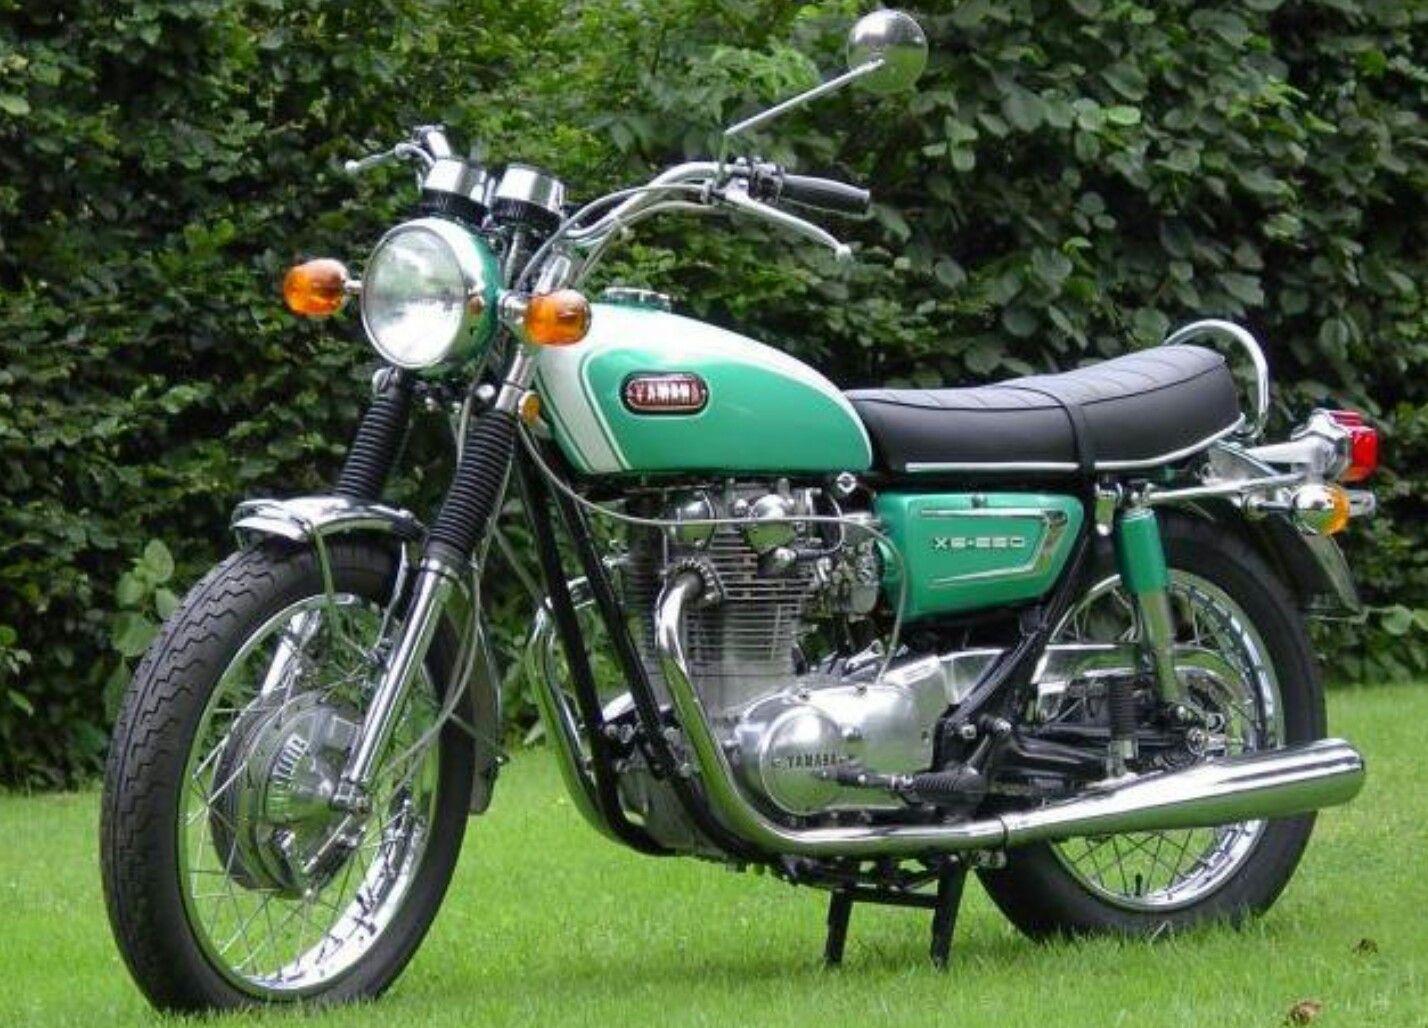 1970 XS 650 XS1 Candy Green | Yamaha motorcycles ...